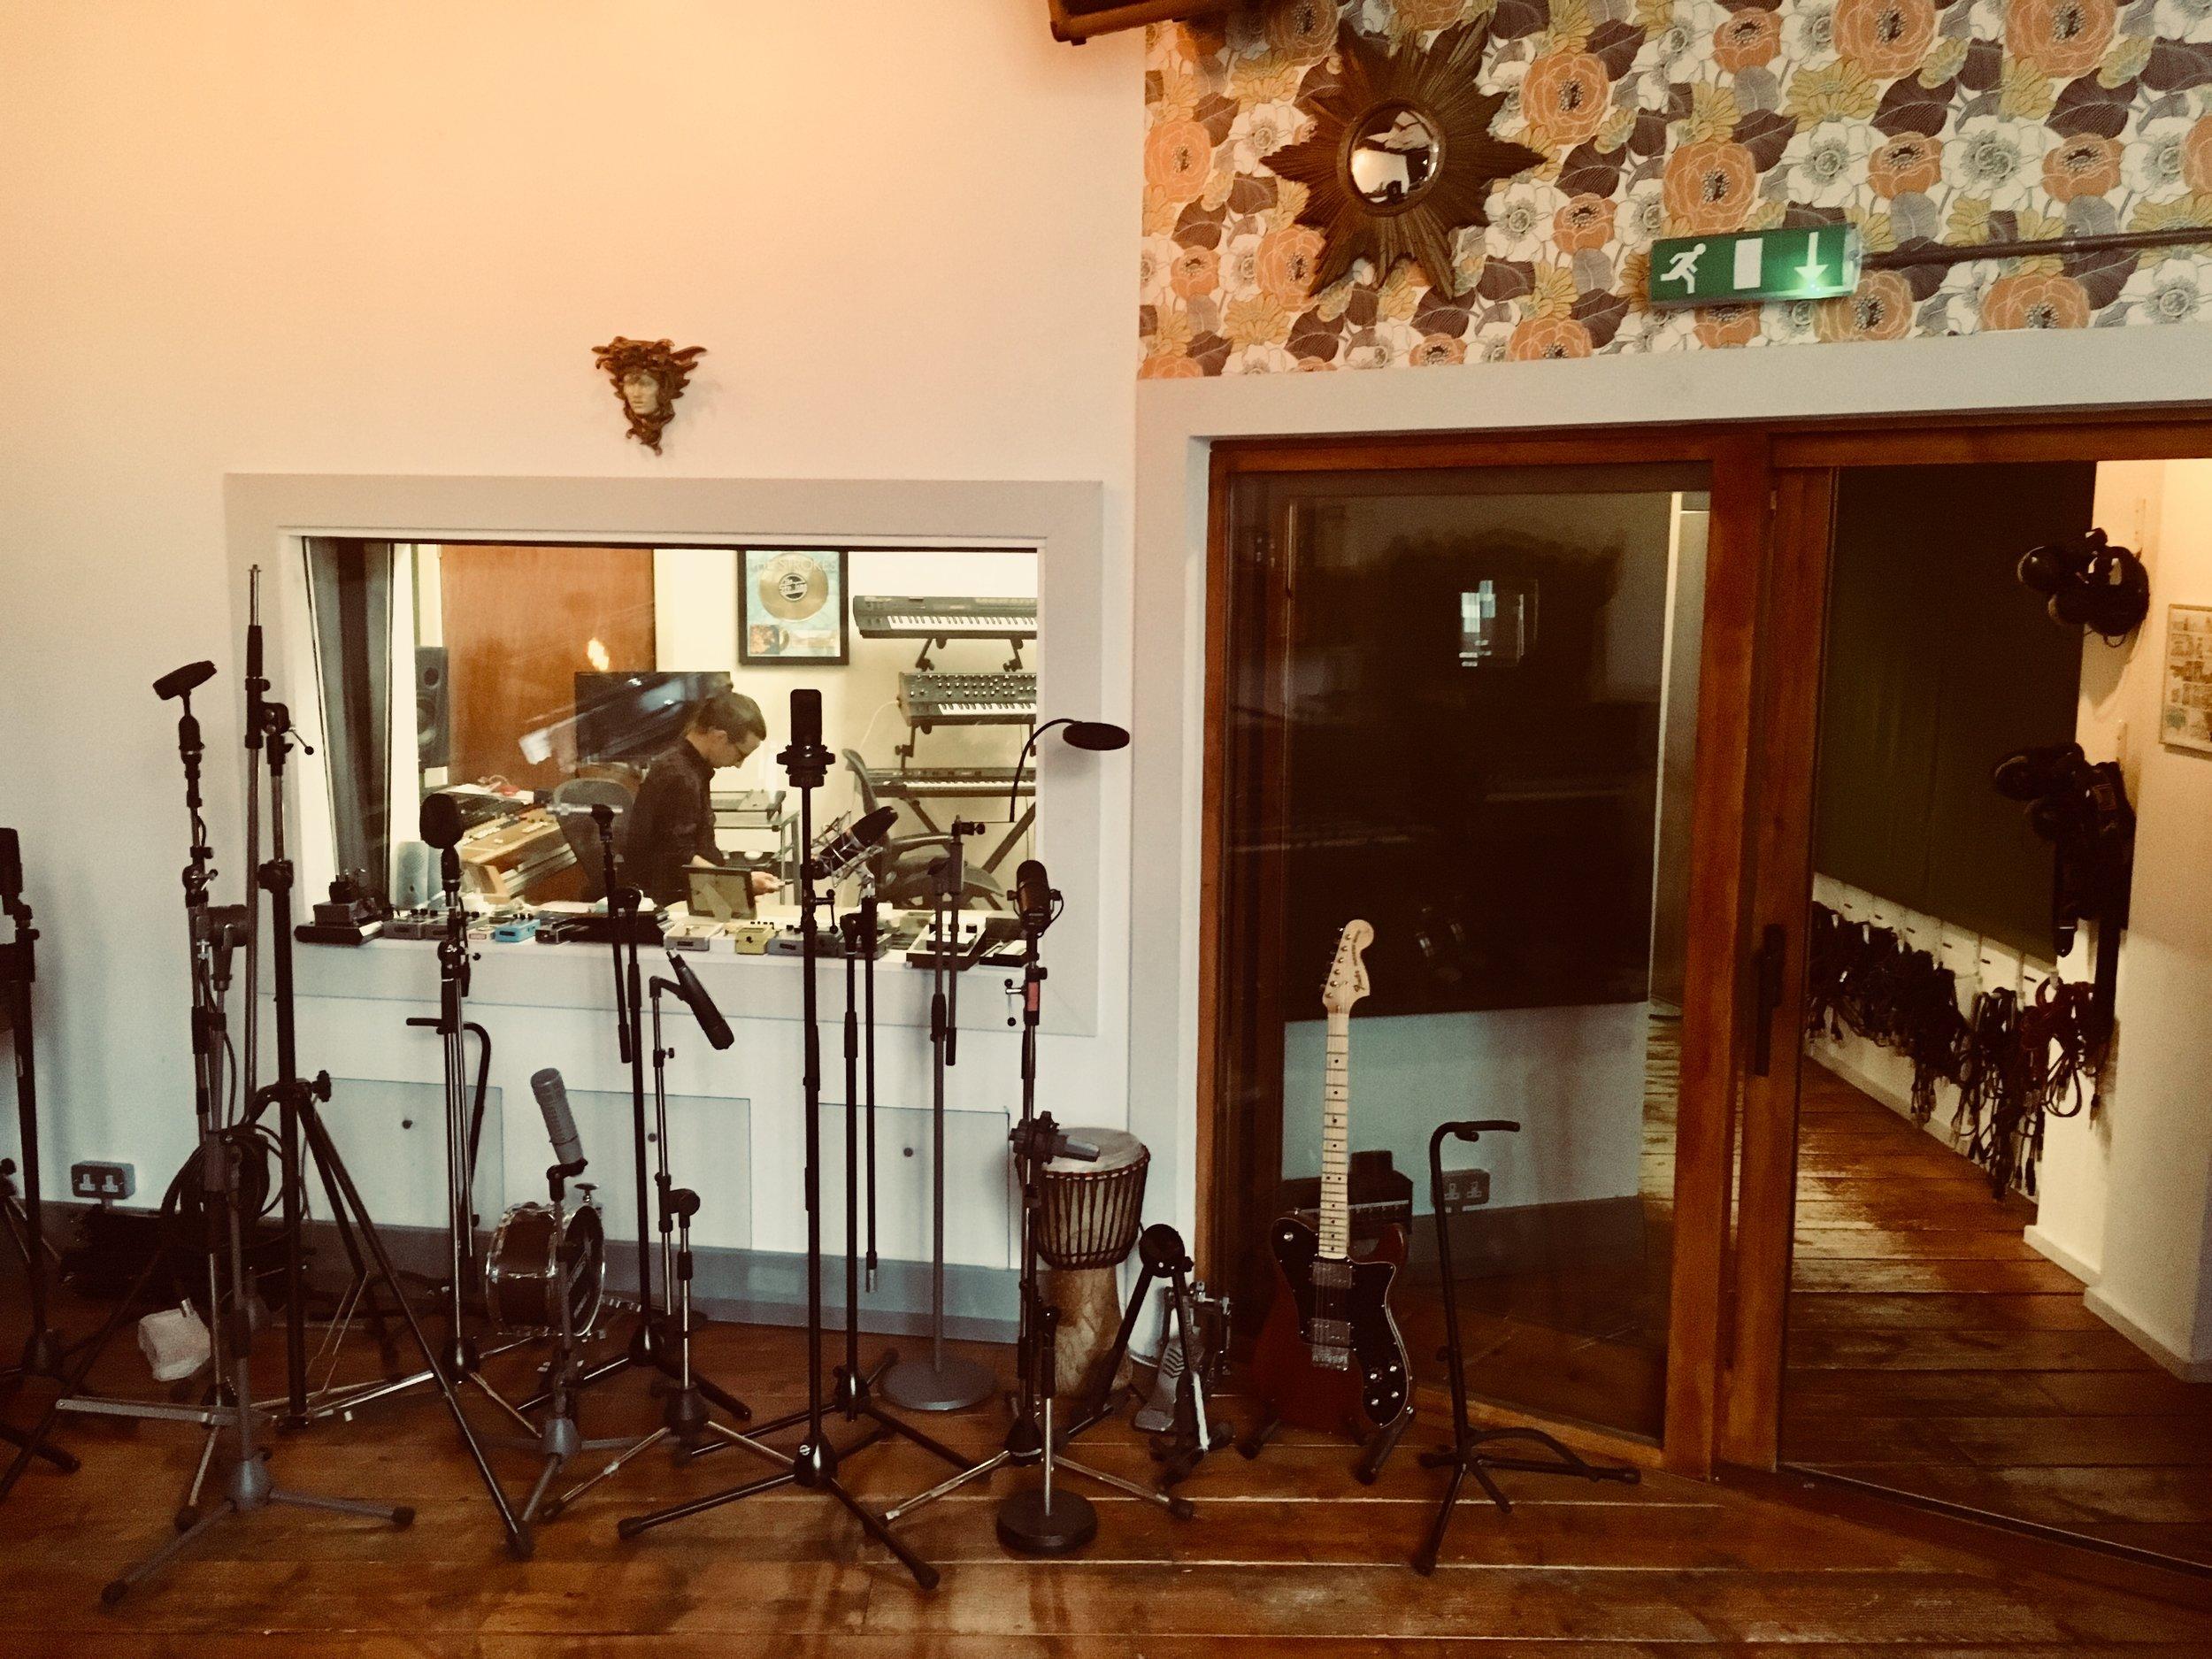 Part of Urchin Studios Live Room